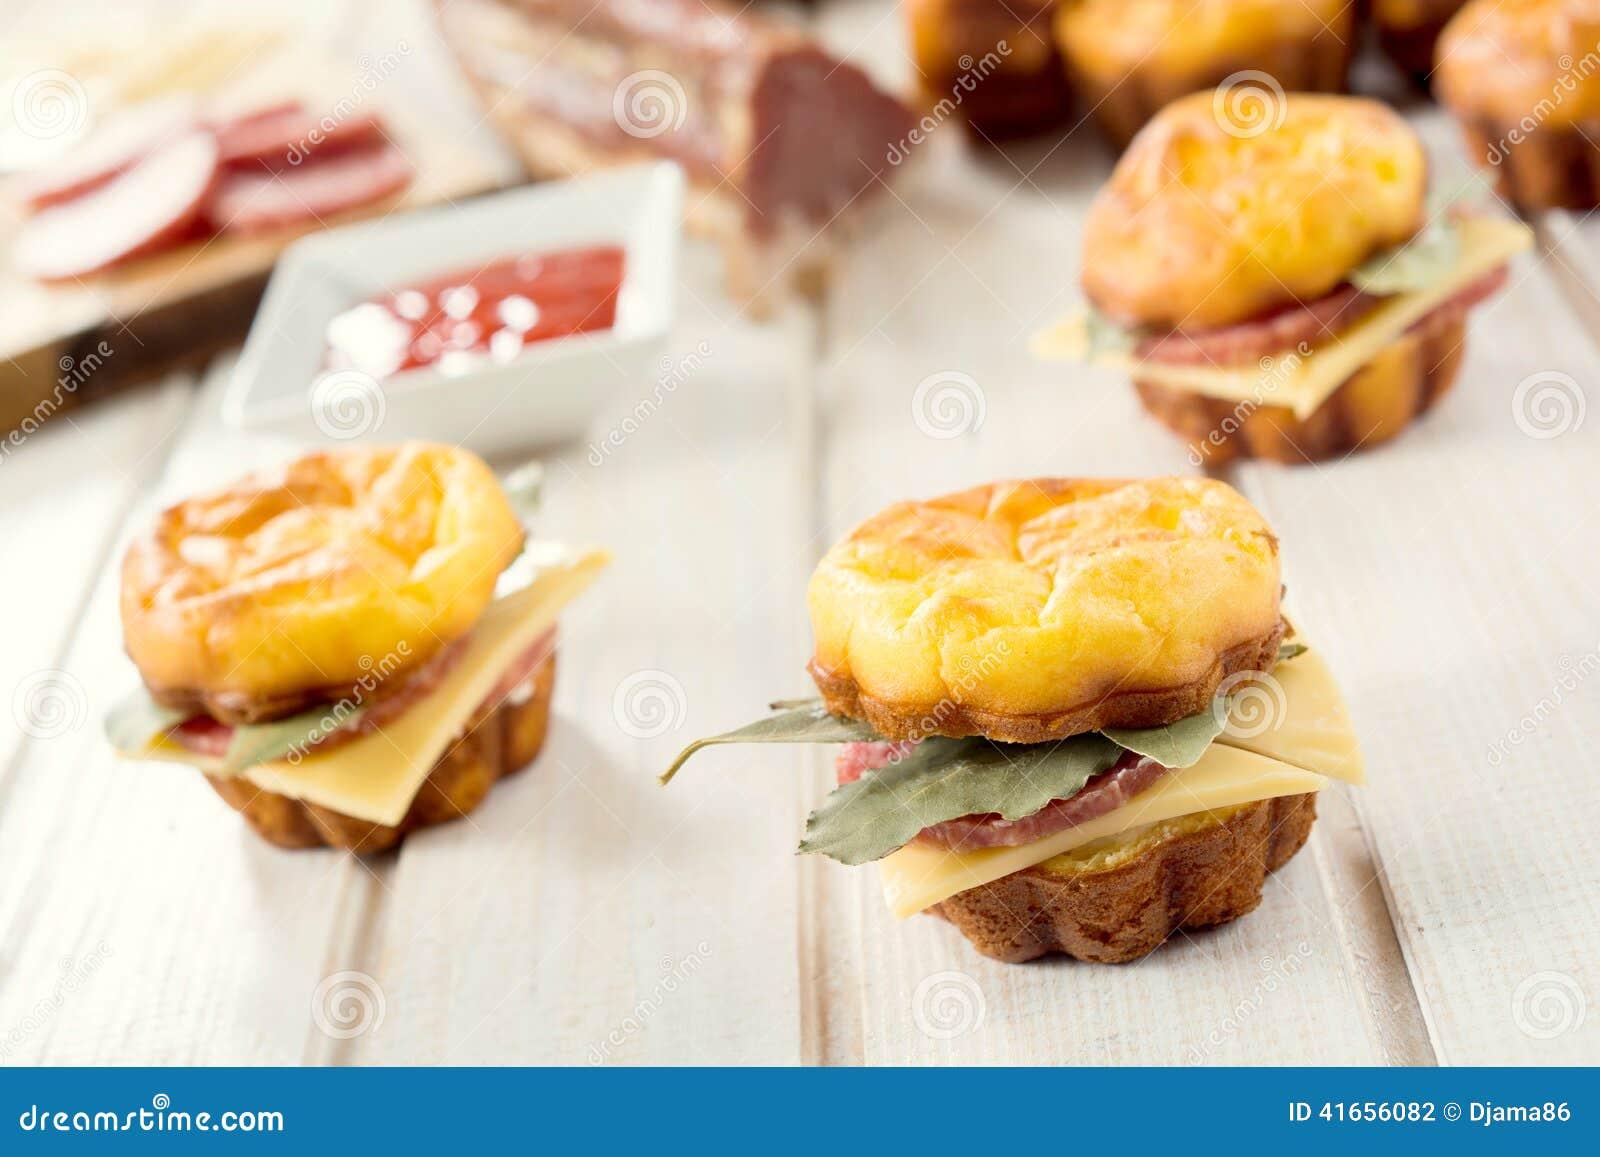 Sandwichs Proja